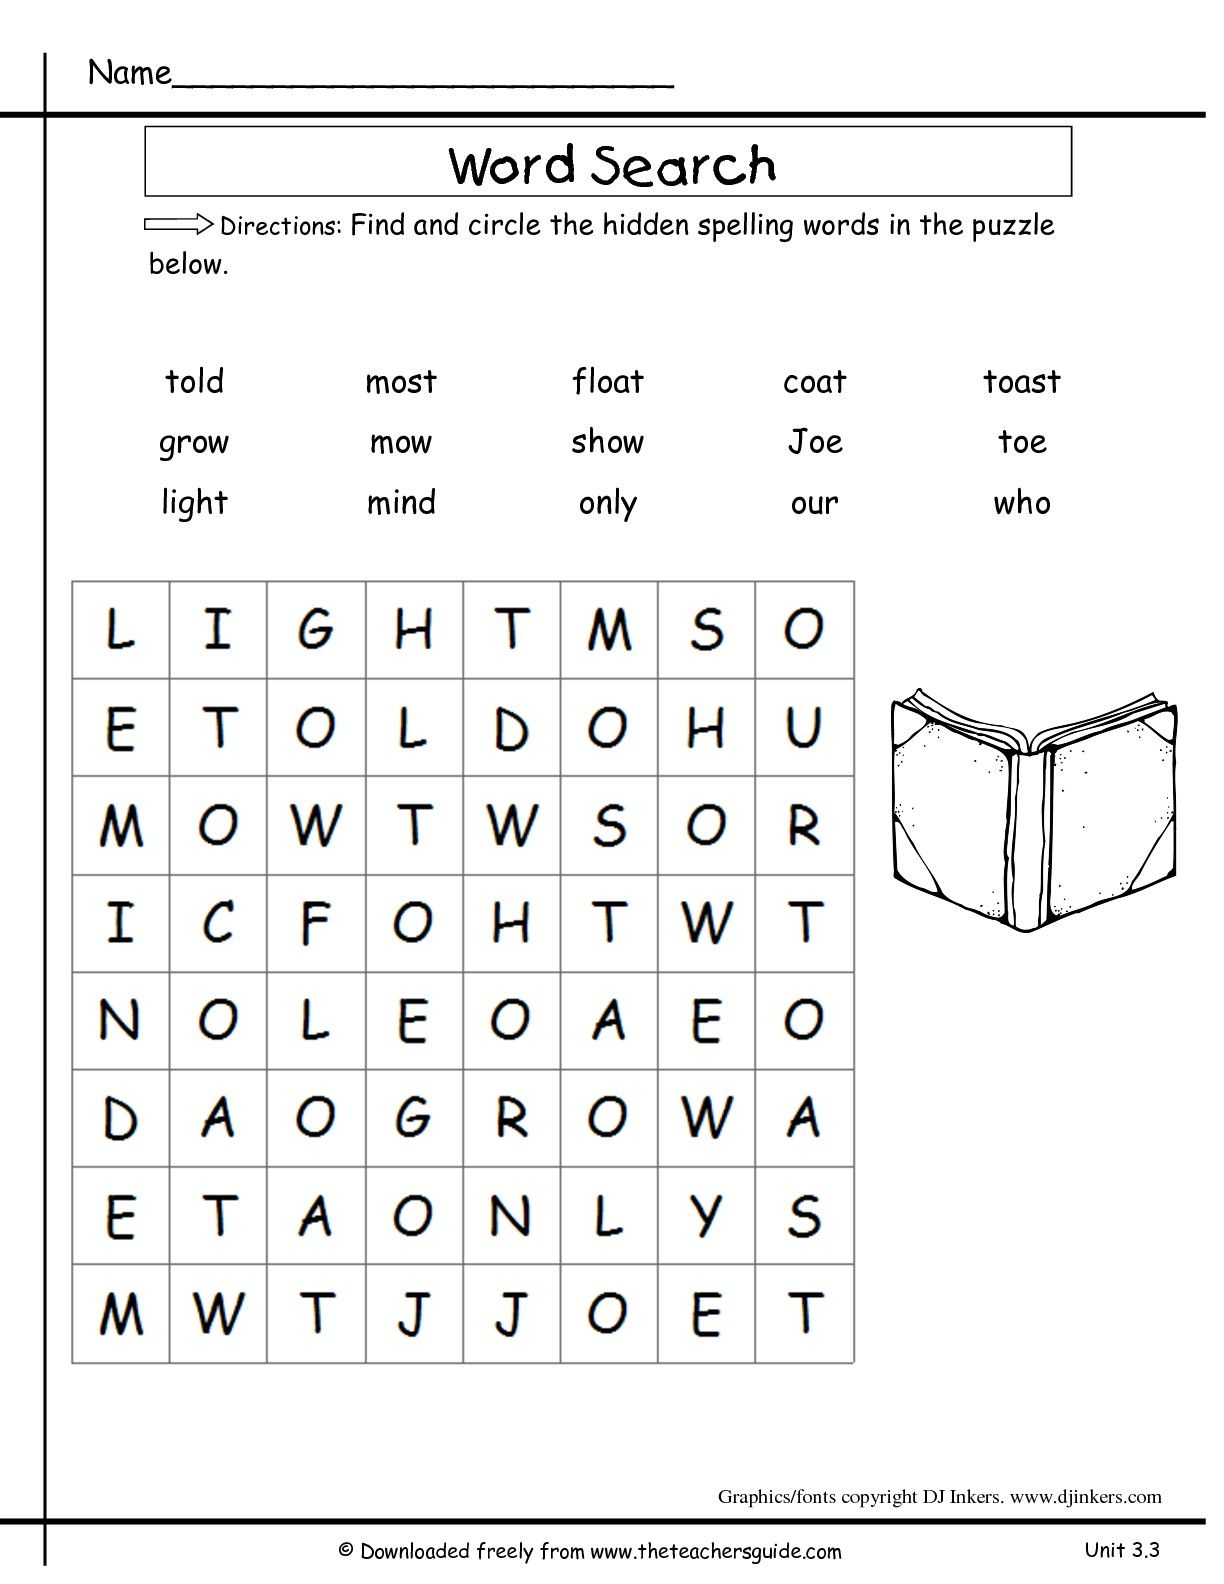 Unitthreeweekthreespellingsearchttg 001 001 Jpg 1224 1584 Spelling Worksheets 2nd Grade Spelling Words Grade Spelling [ 1584 x 1224 Pixel ]